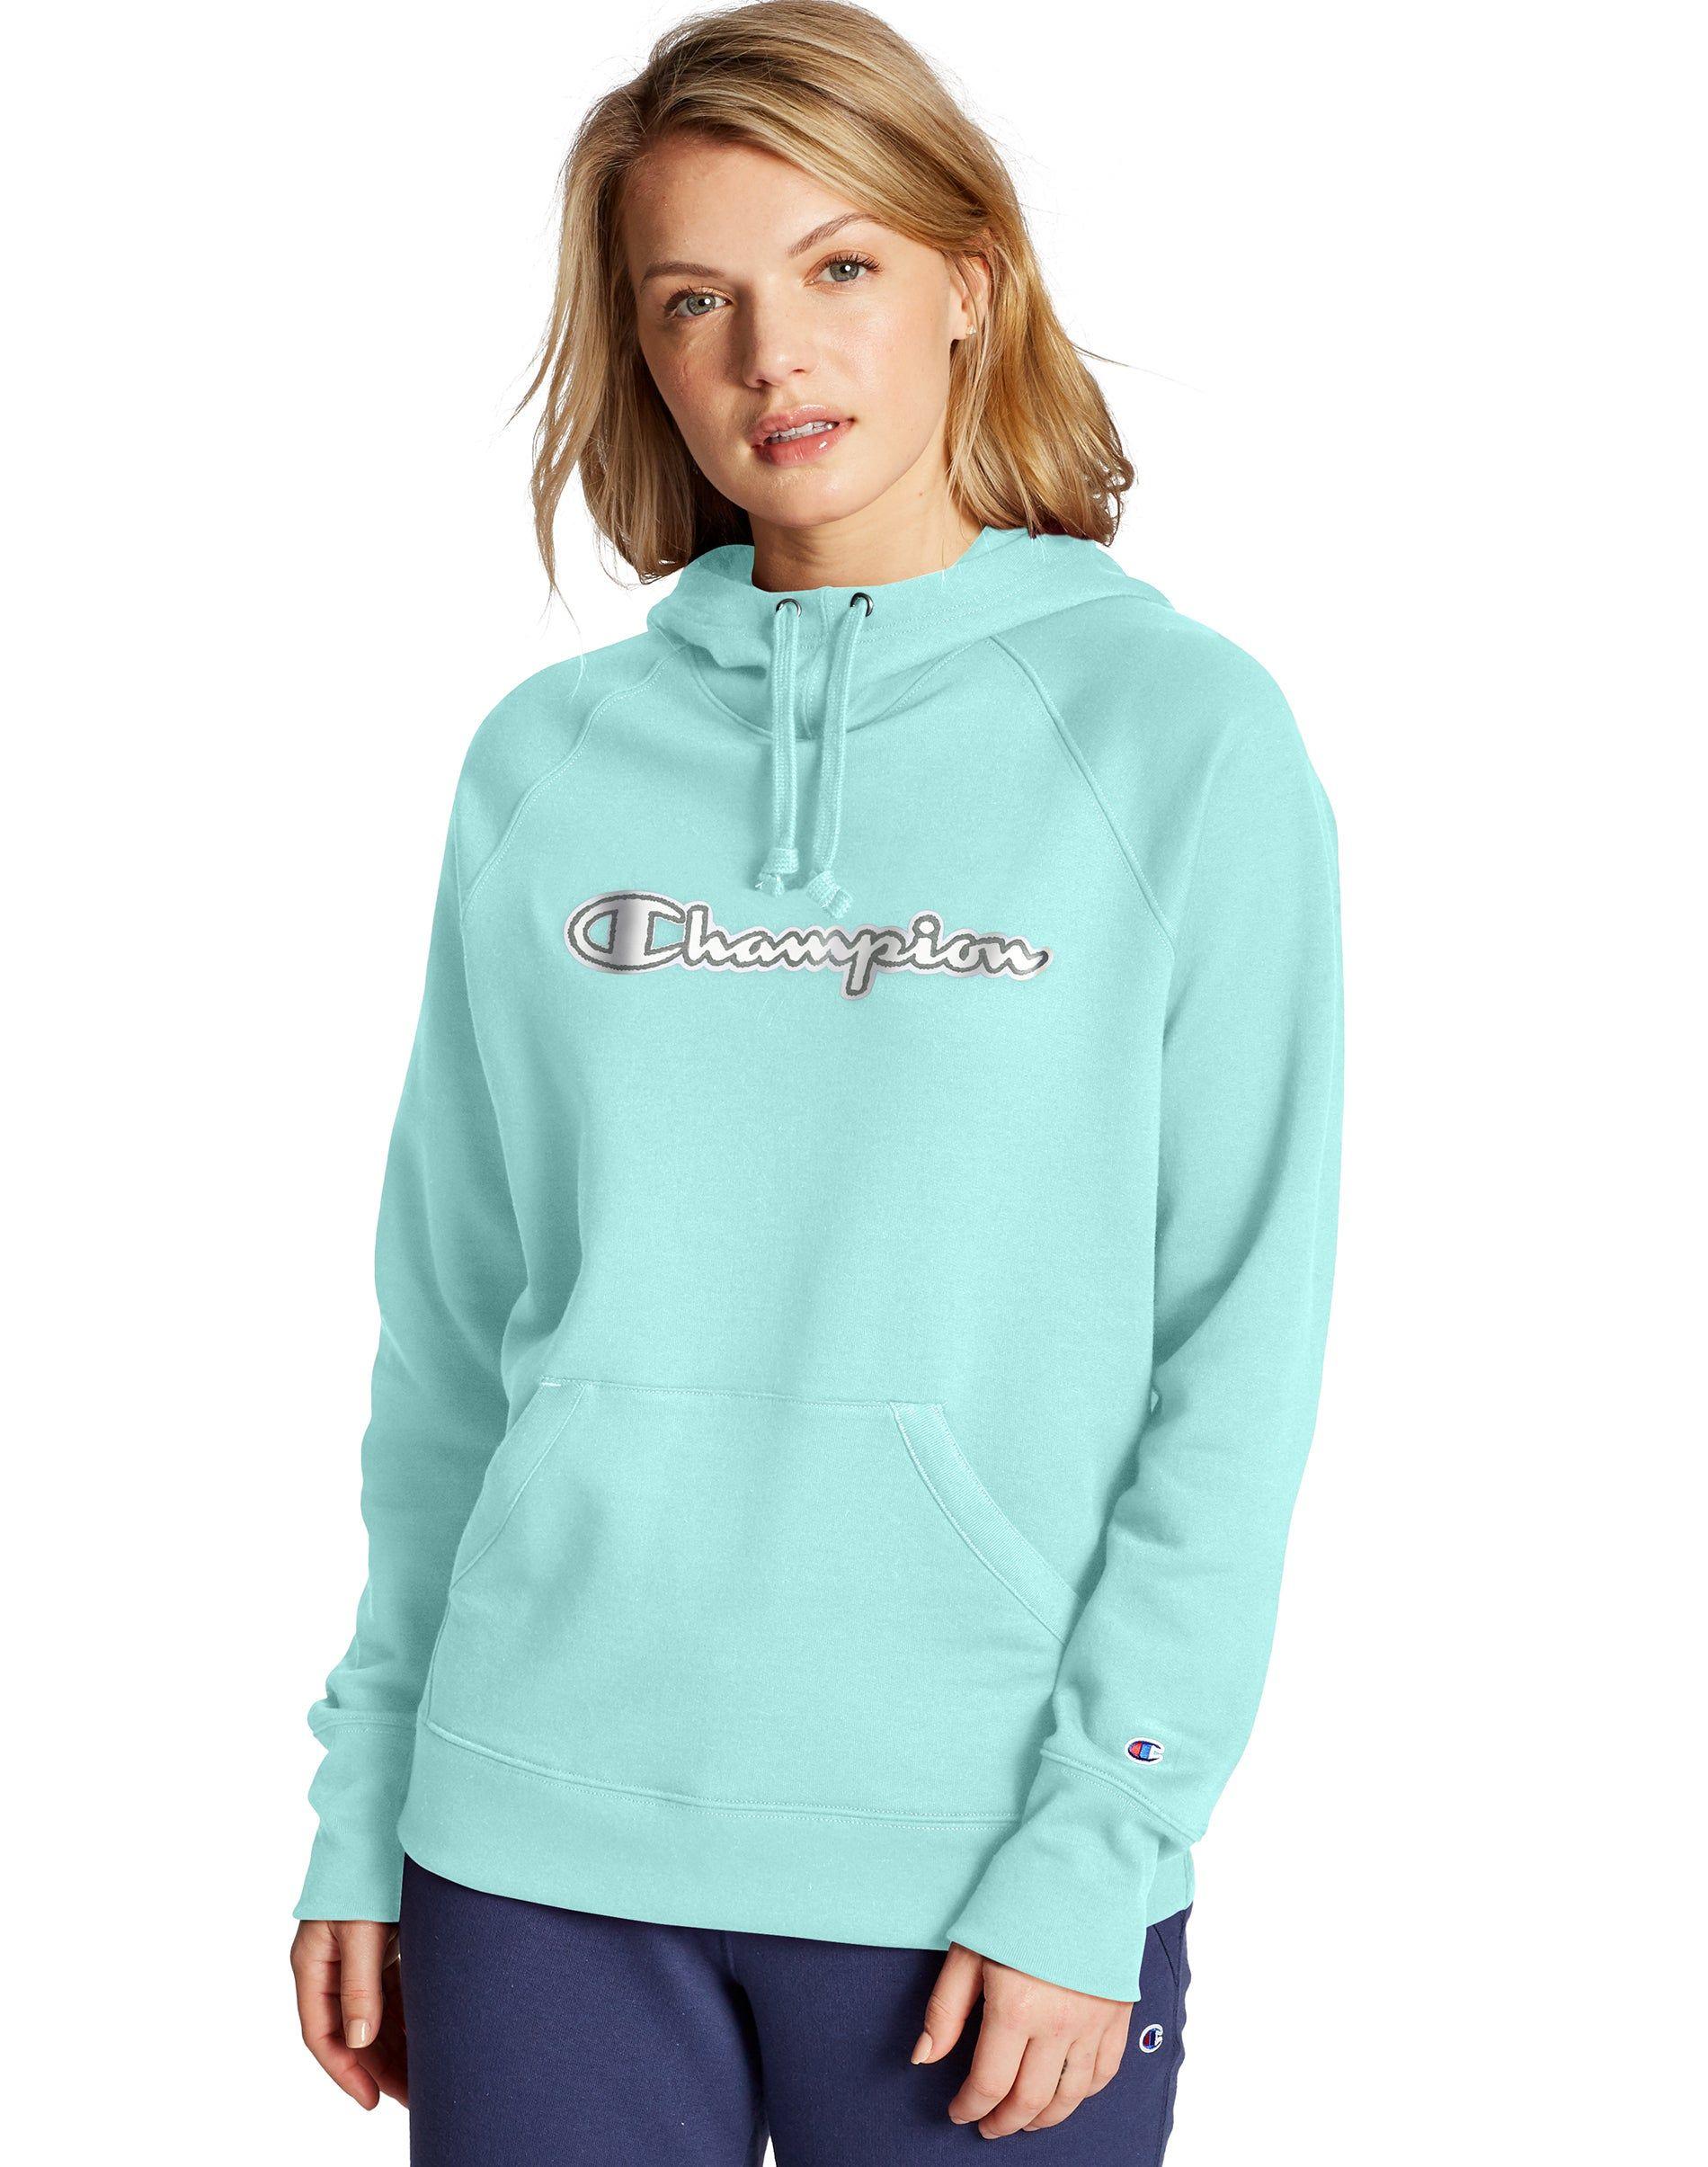 Champion Women S Athletics Powerblend Fleece Pullover Hoodie Chainstitch Logo Amazing Aqua Applique Hoodie Hoodies Hoodies Womens Pullover [ 2410 x 1900 Pixel ]